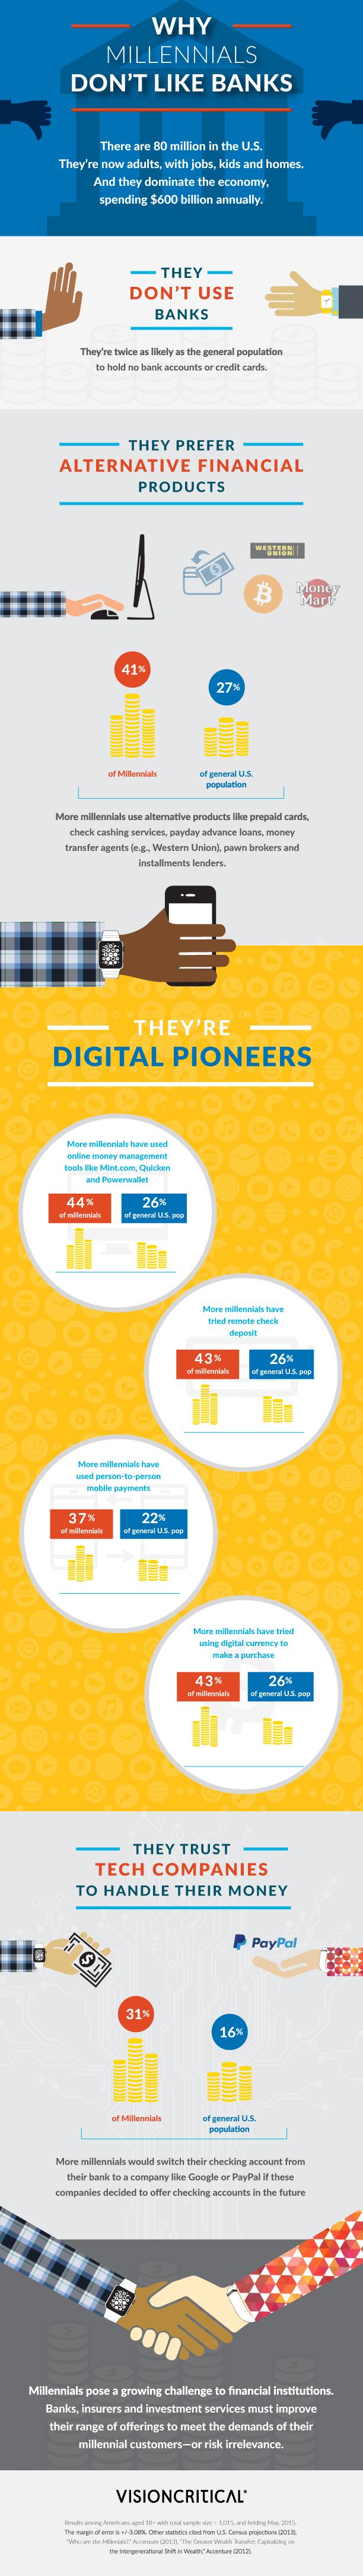 millenials-infographic_v2-1